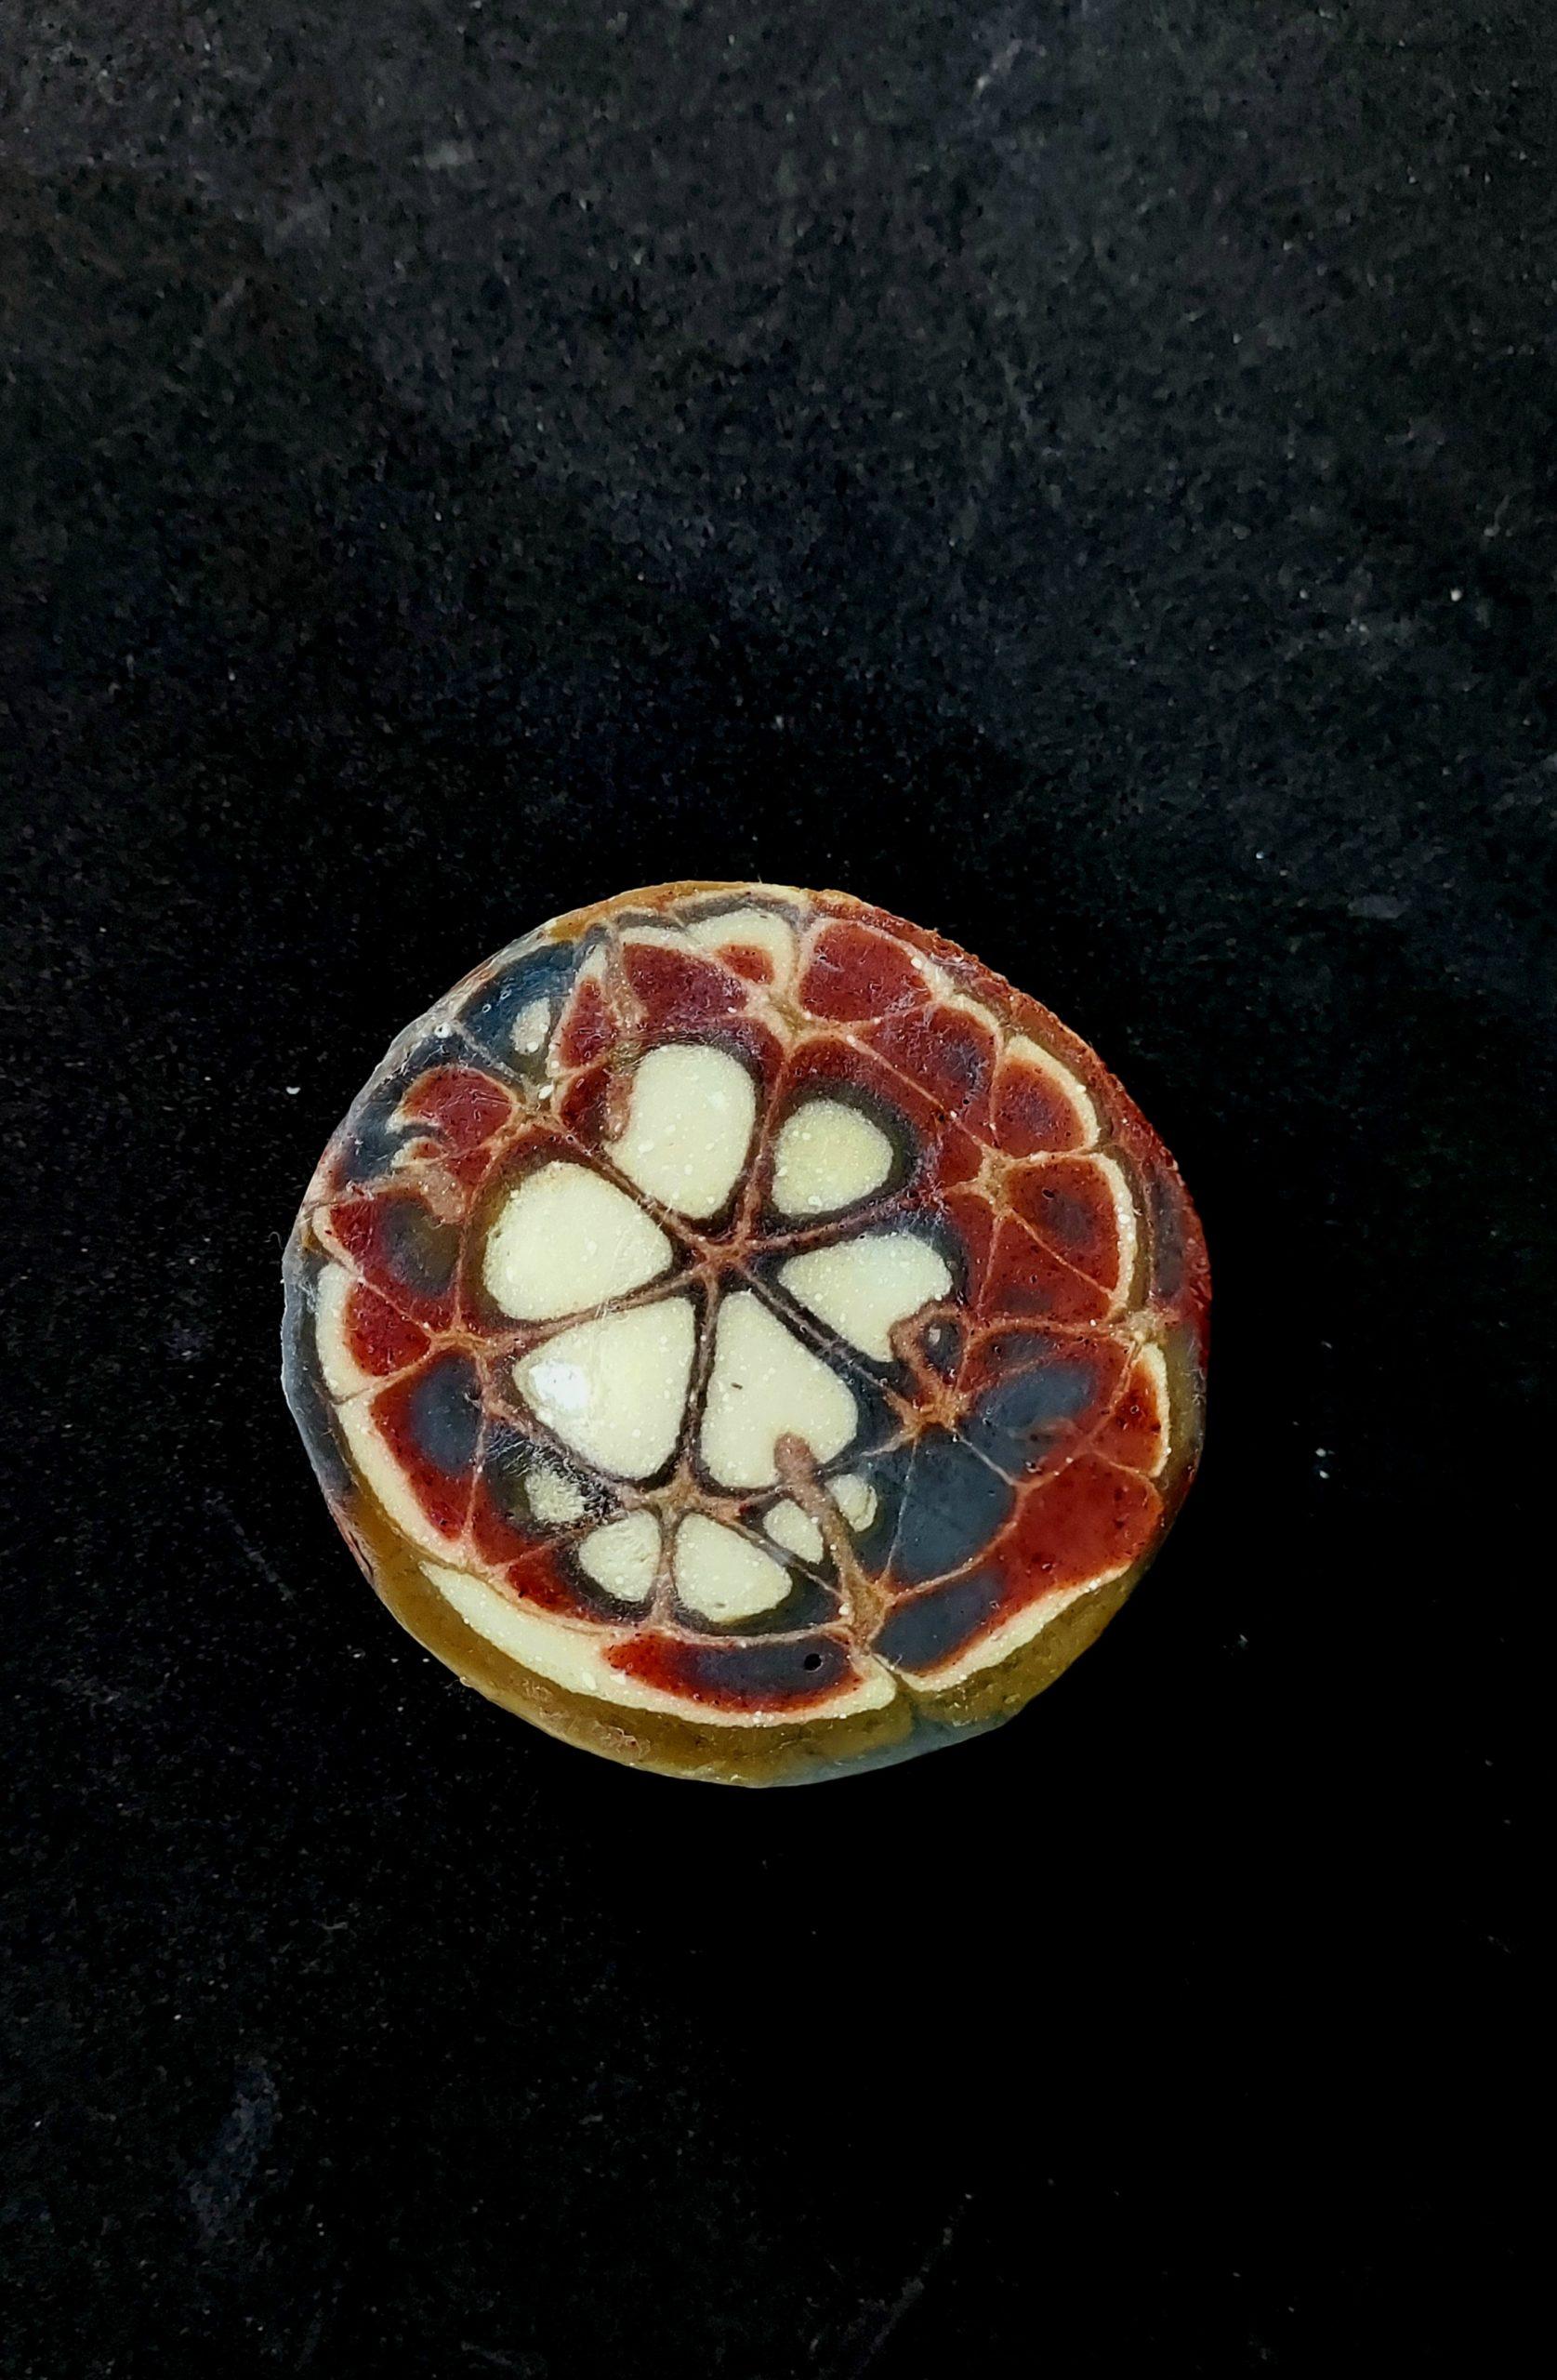 Kaleidoscope soap